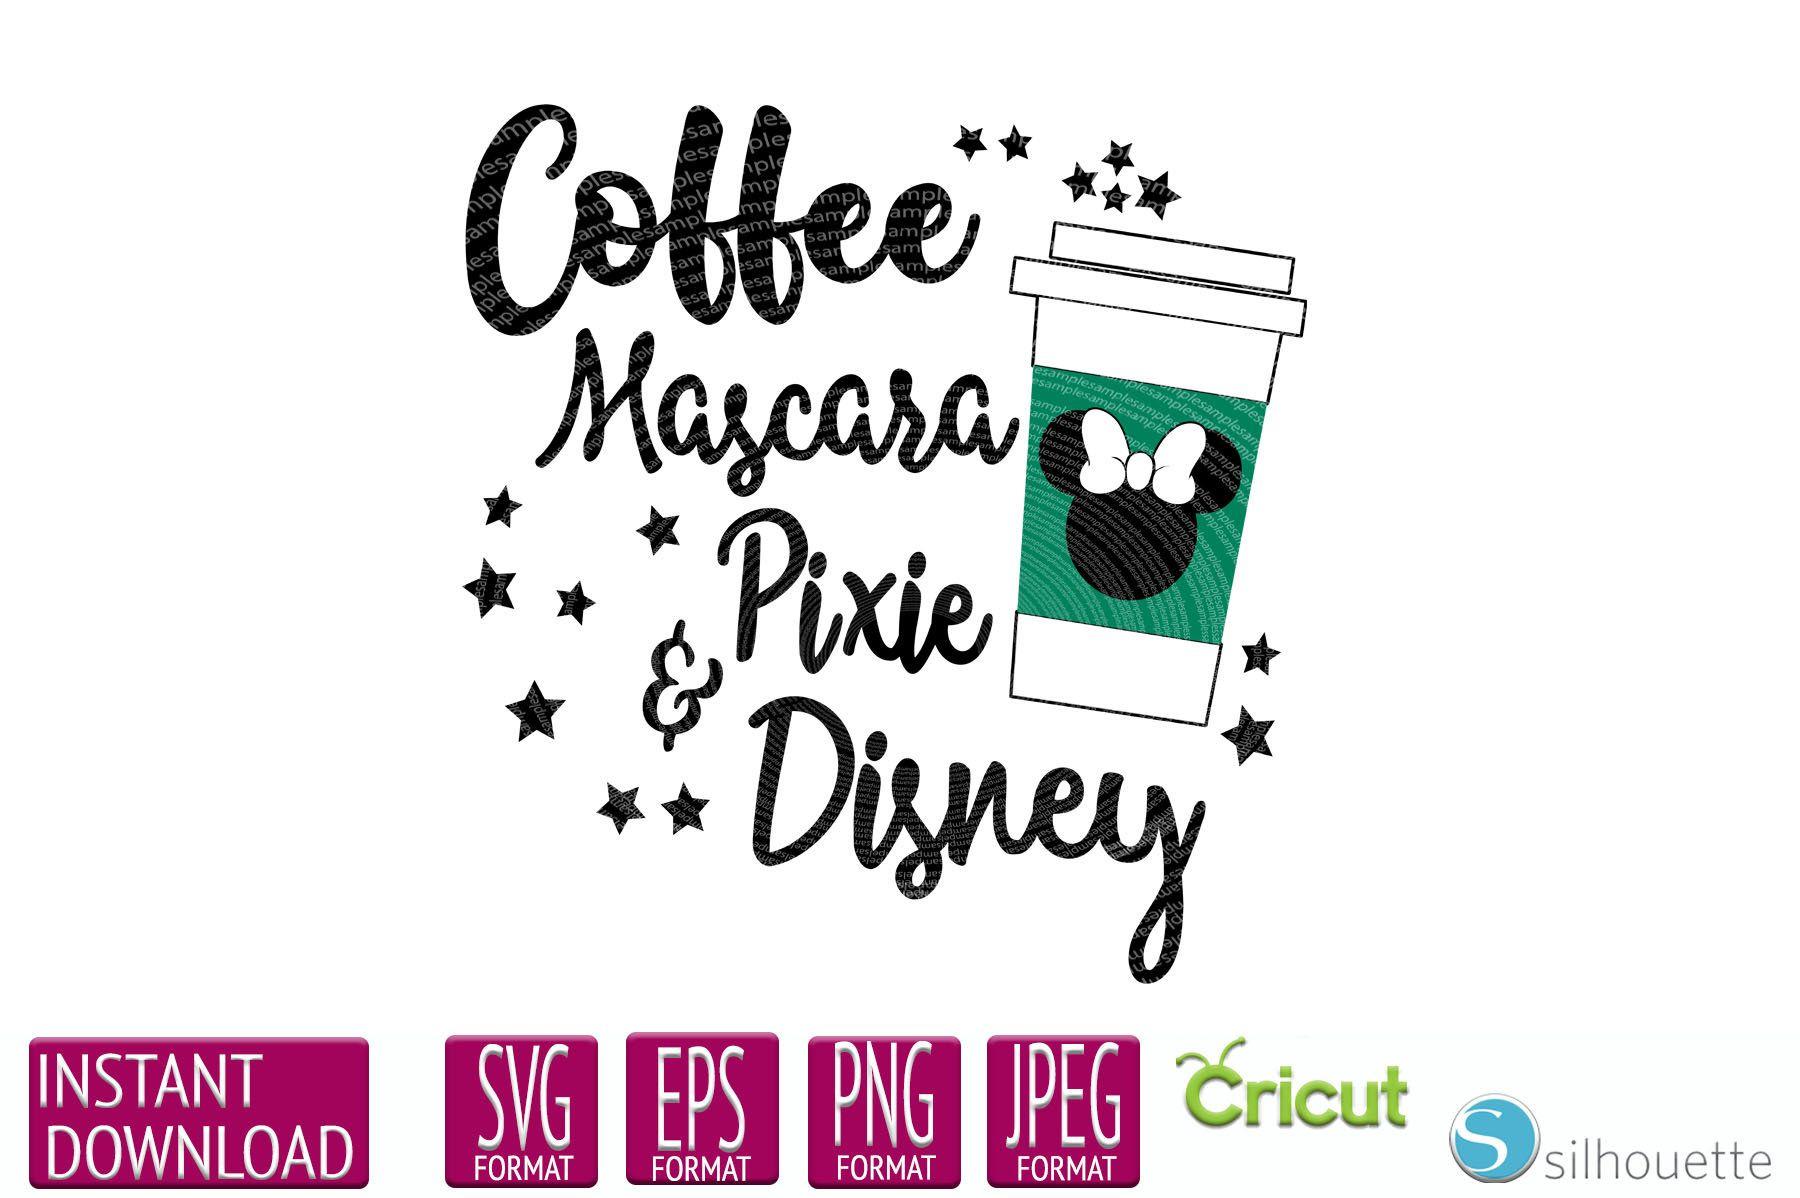 Disney svg, Disney Shirt, Disney and Starbucks, Starbucks